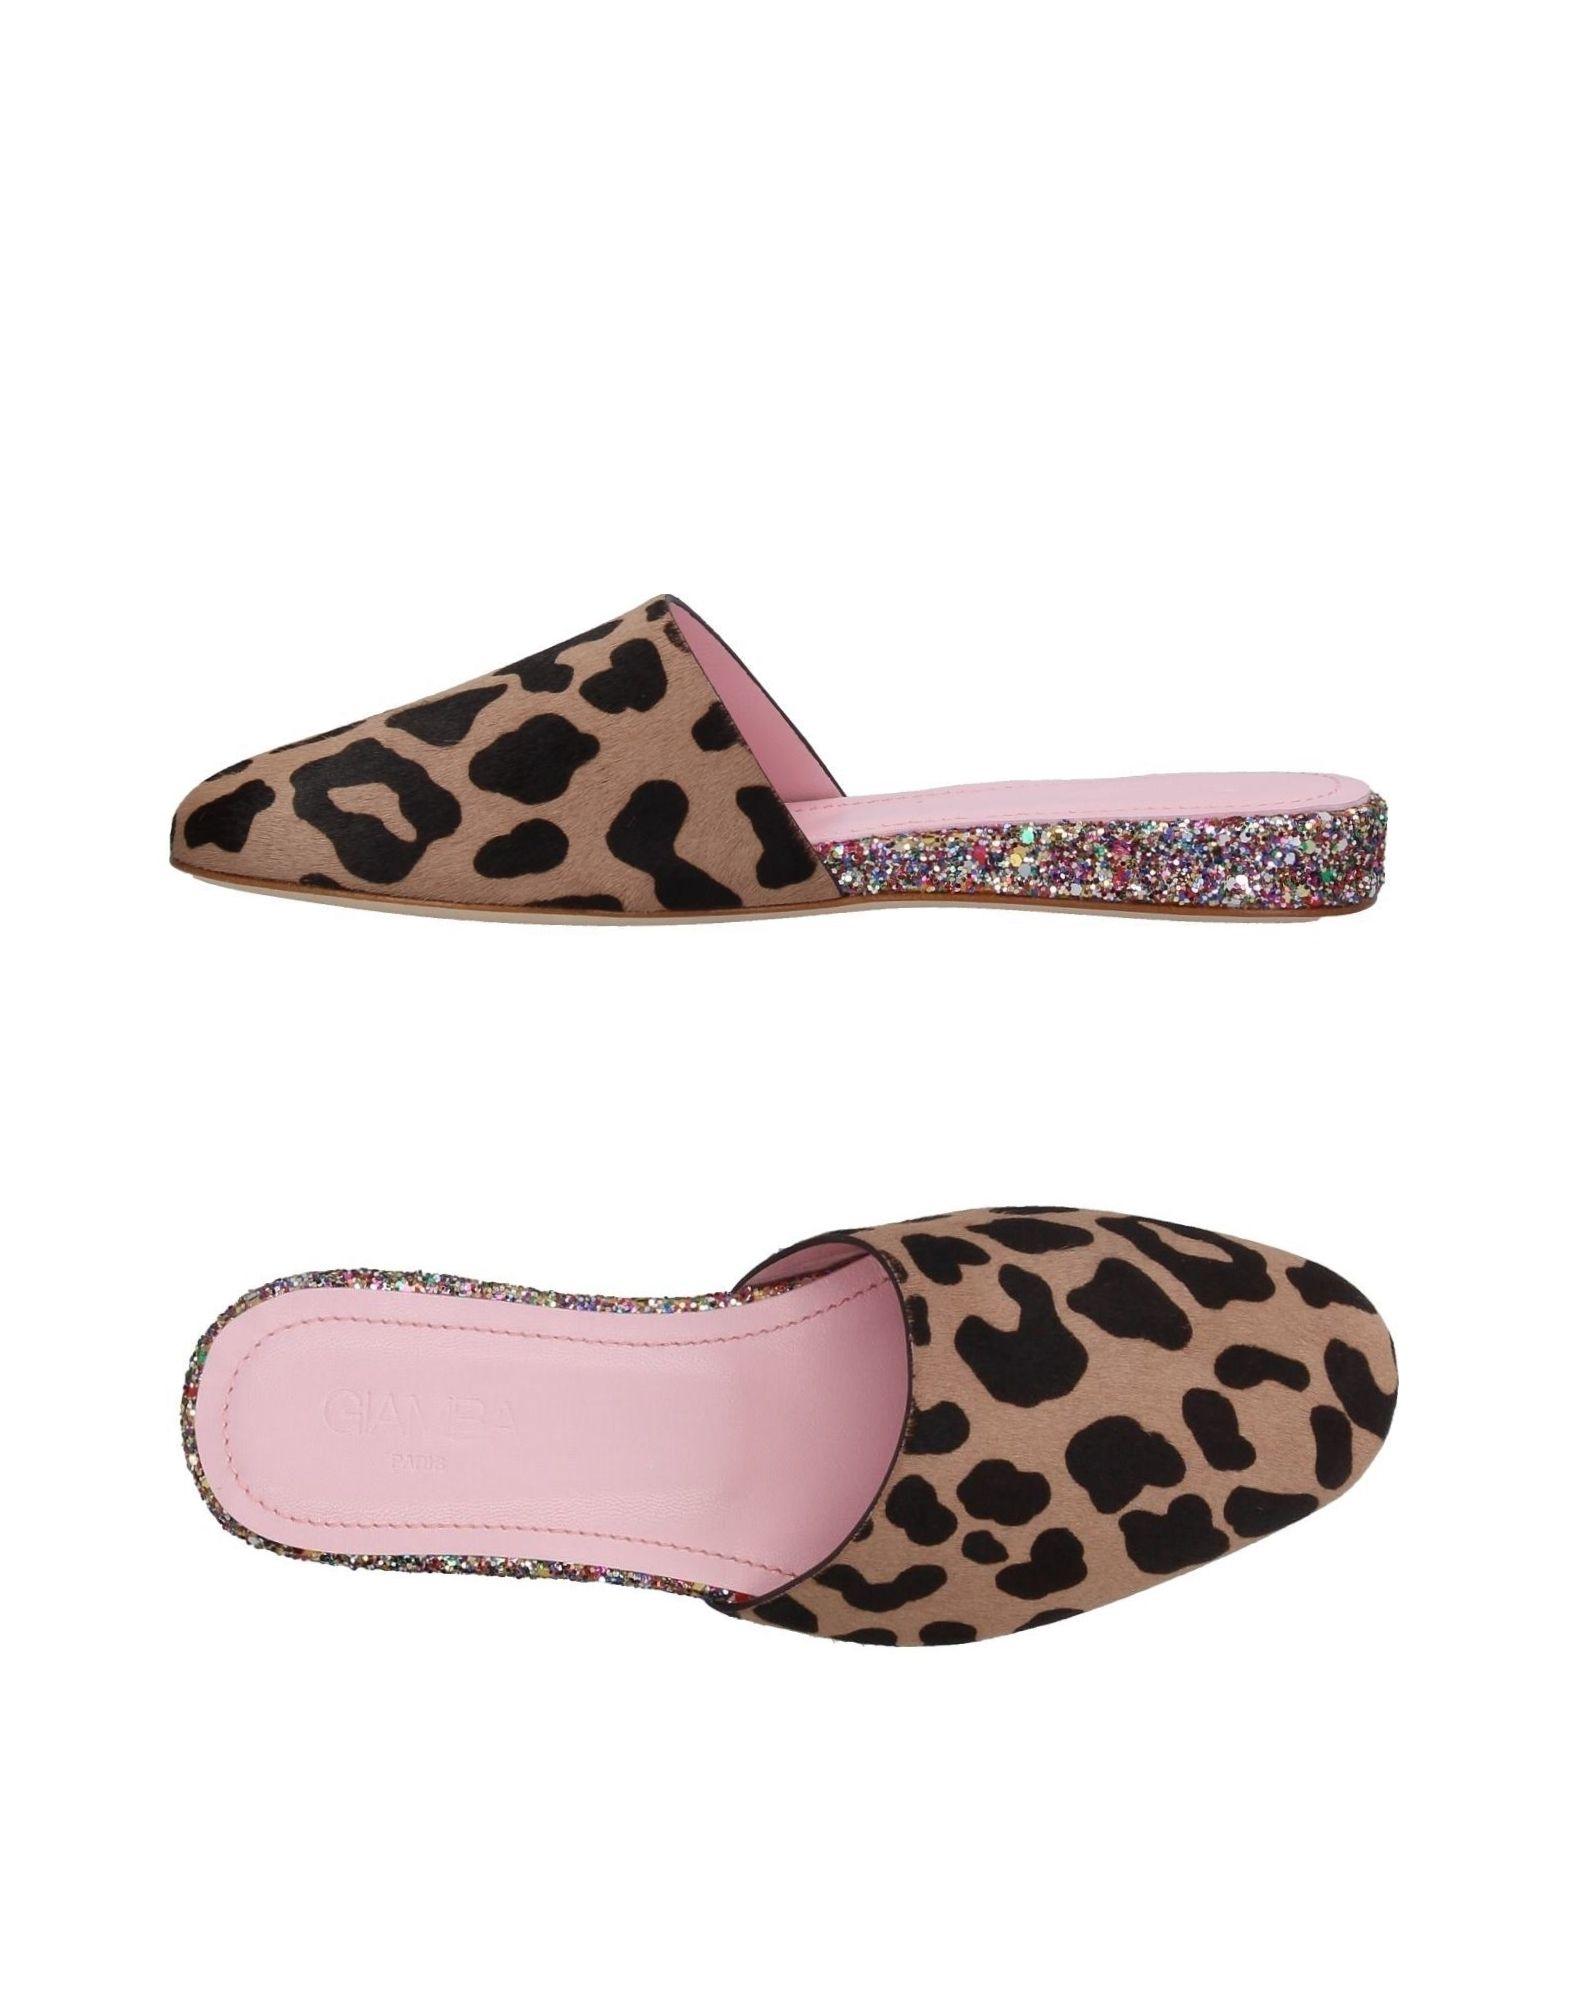 Sandales Giamba Femme - Sandales Giamba sur